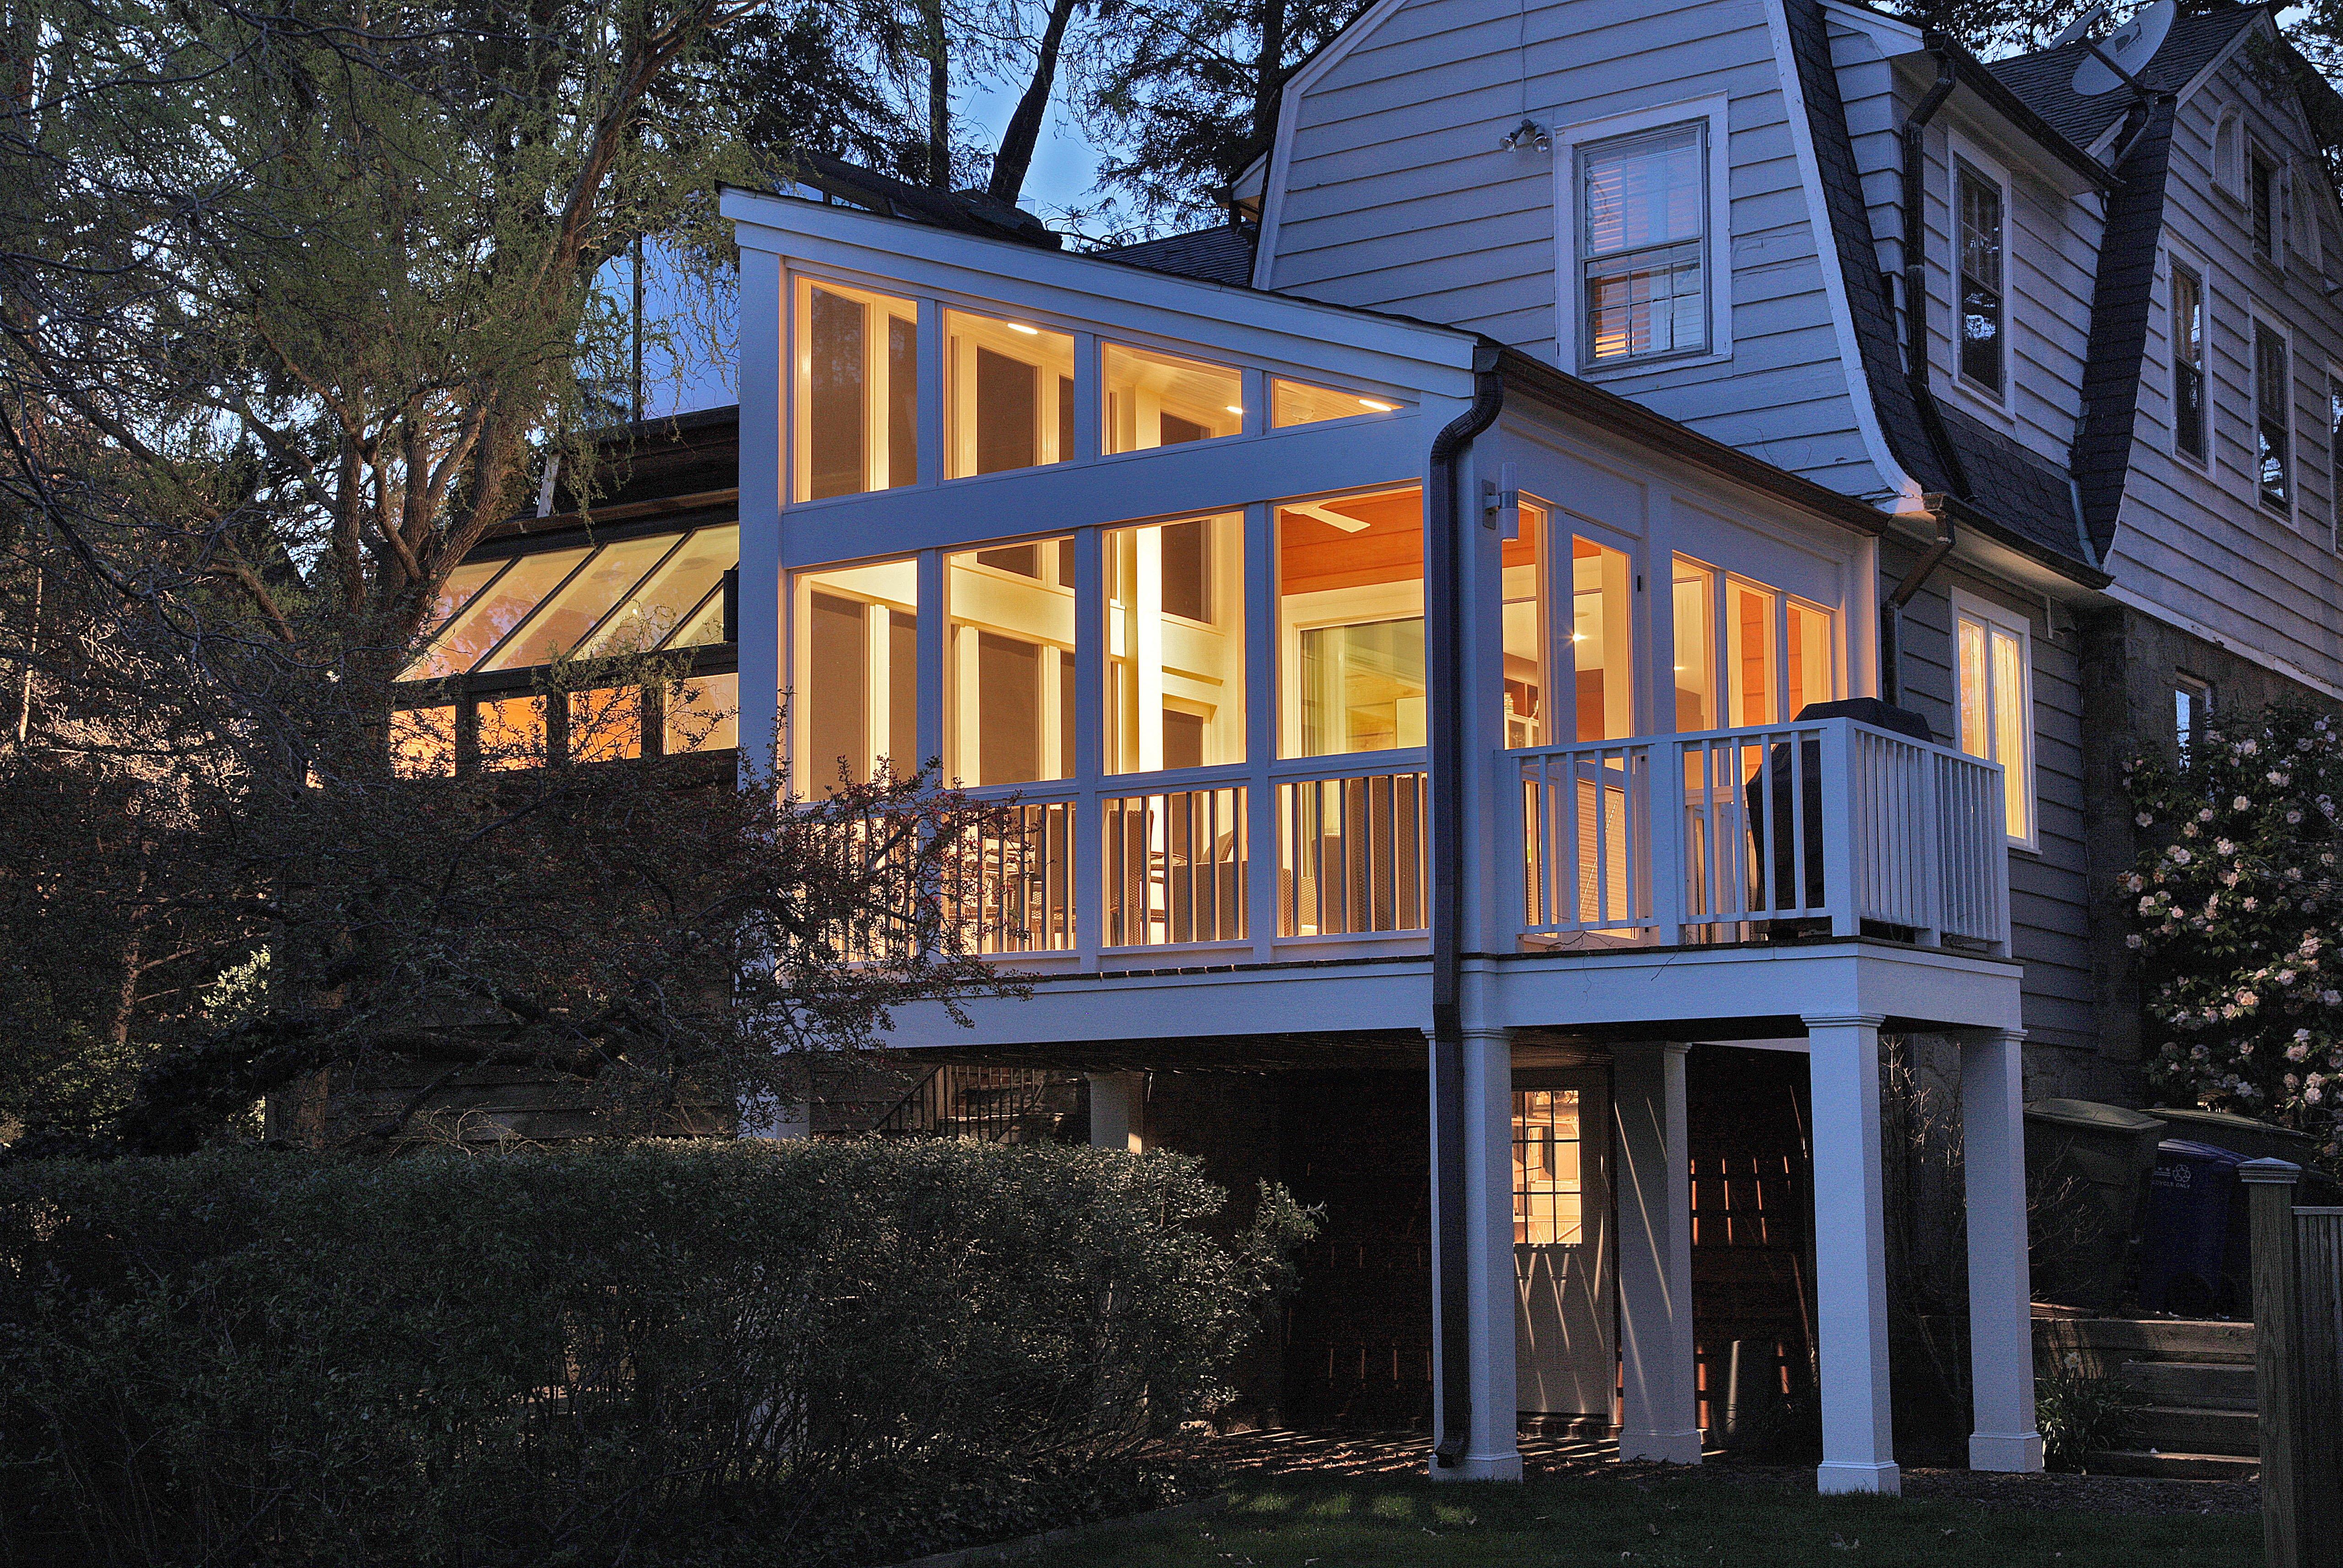 Exterior View of Porch